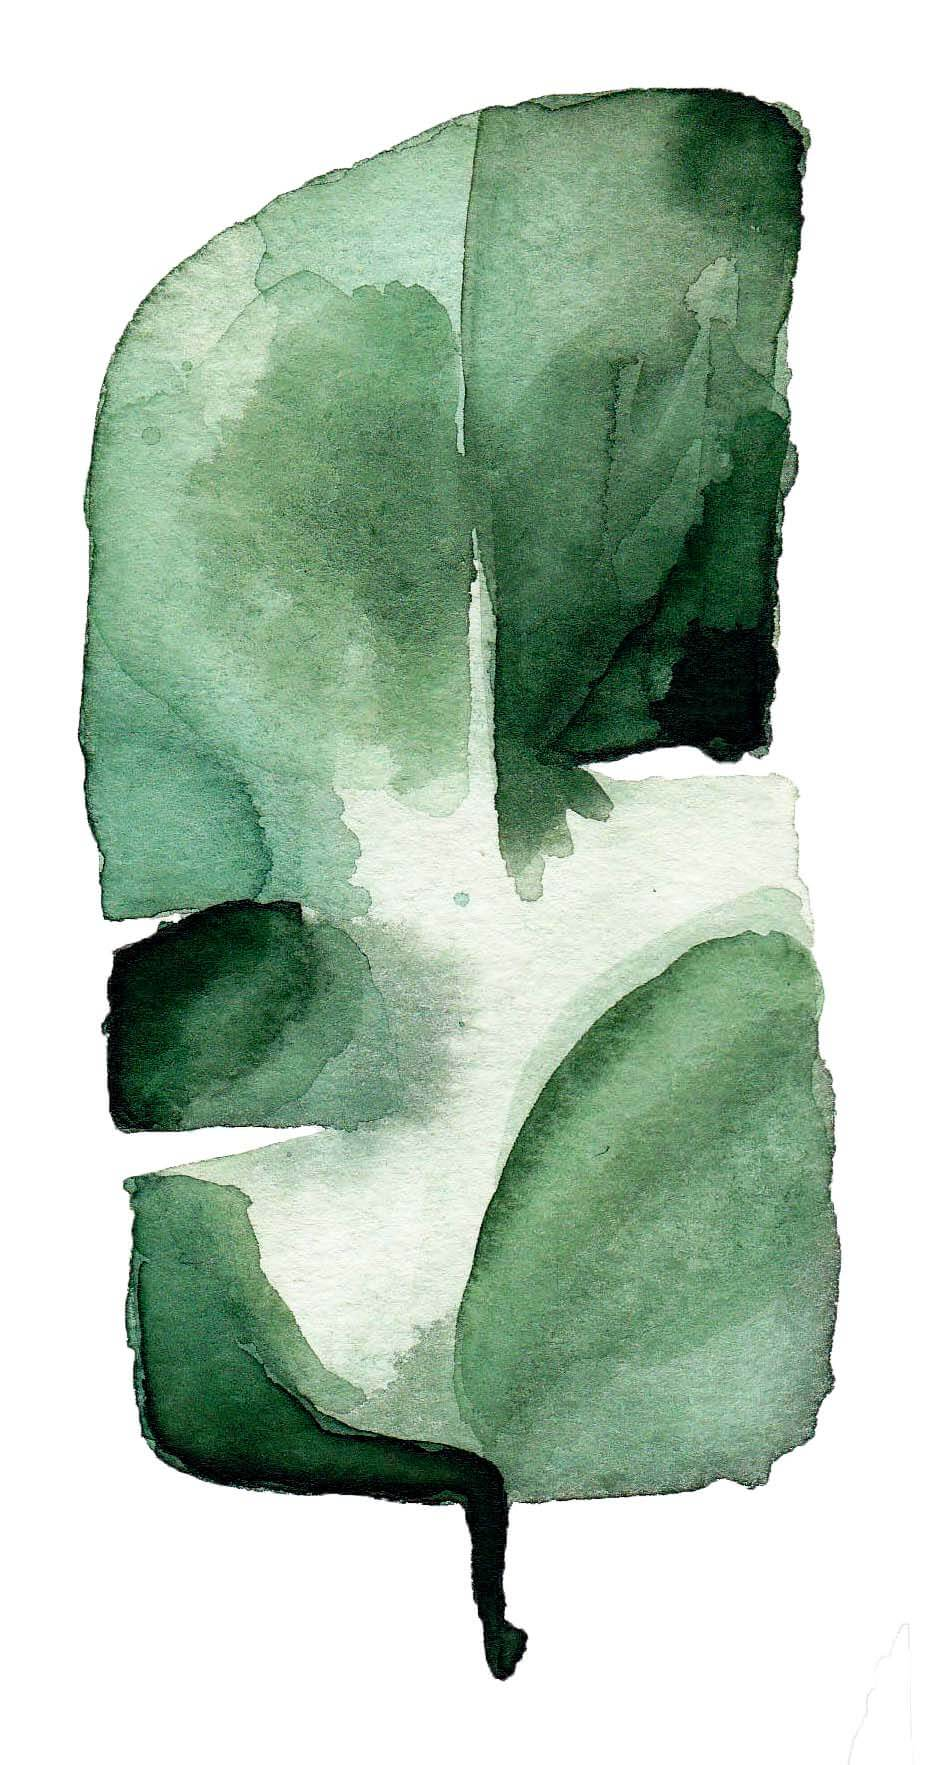 On Cloud Bloom - banana leaf 1